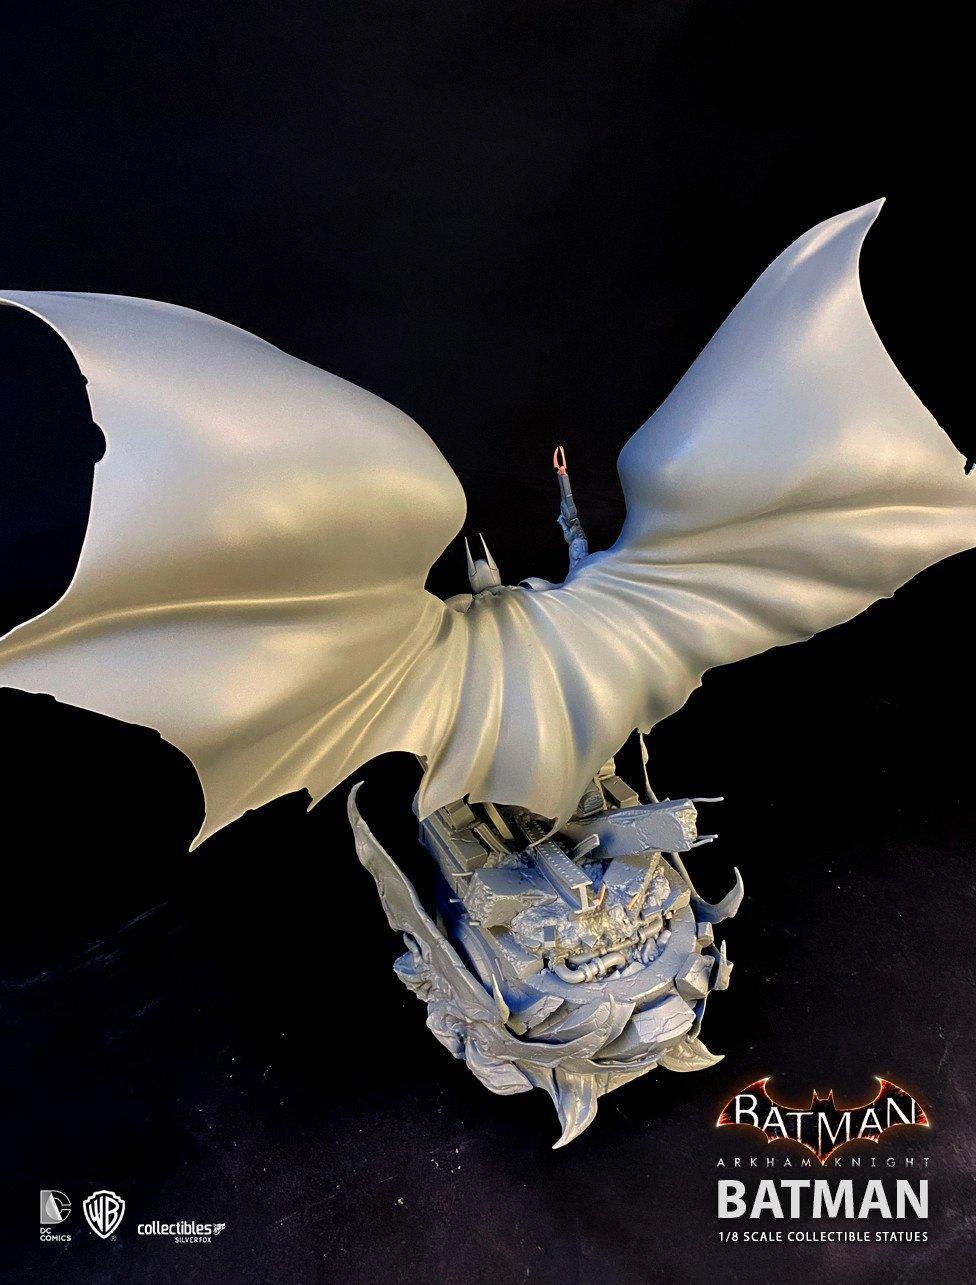 Batman siver fox collectibles batman arkham knight 1 8 scale statue7